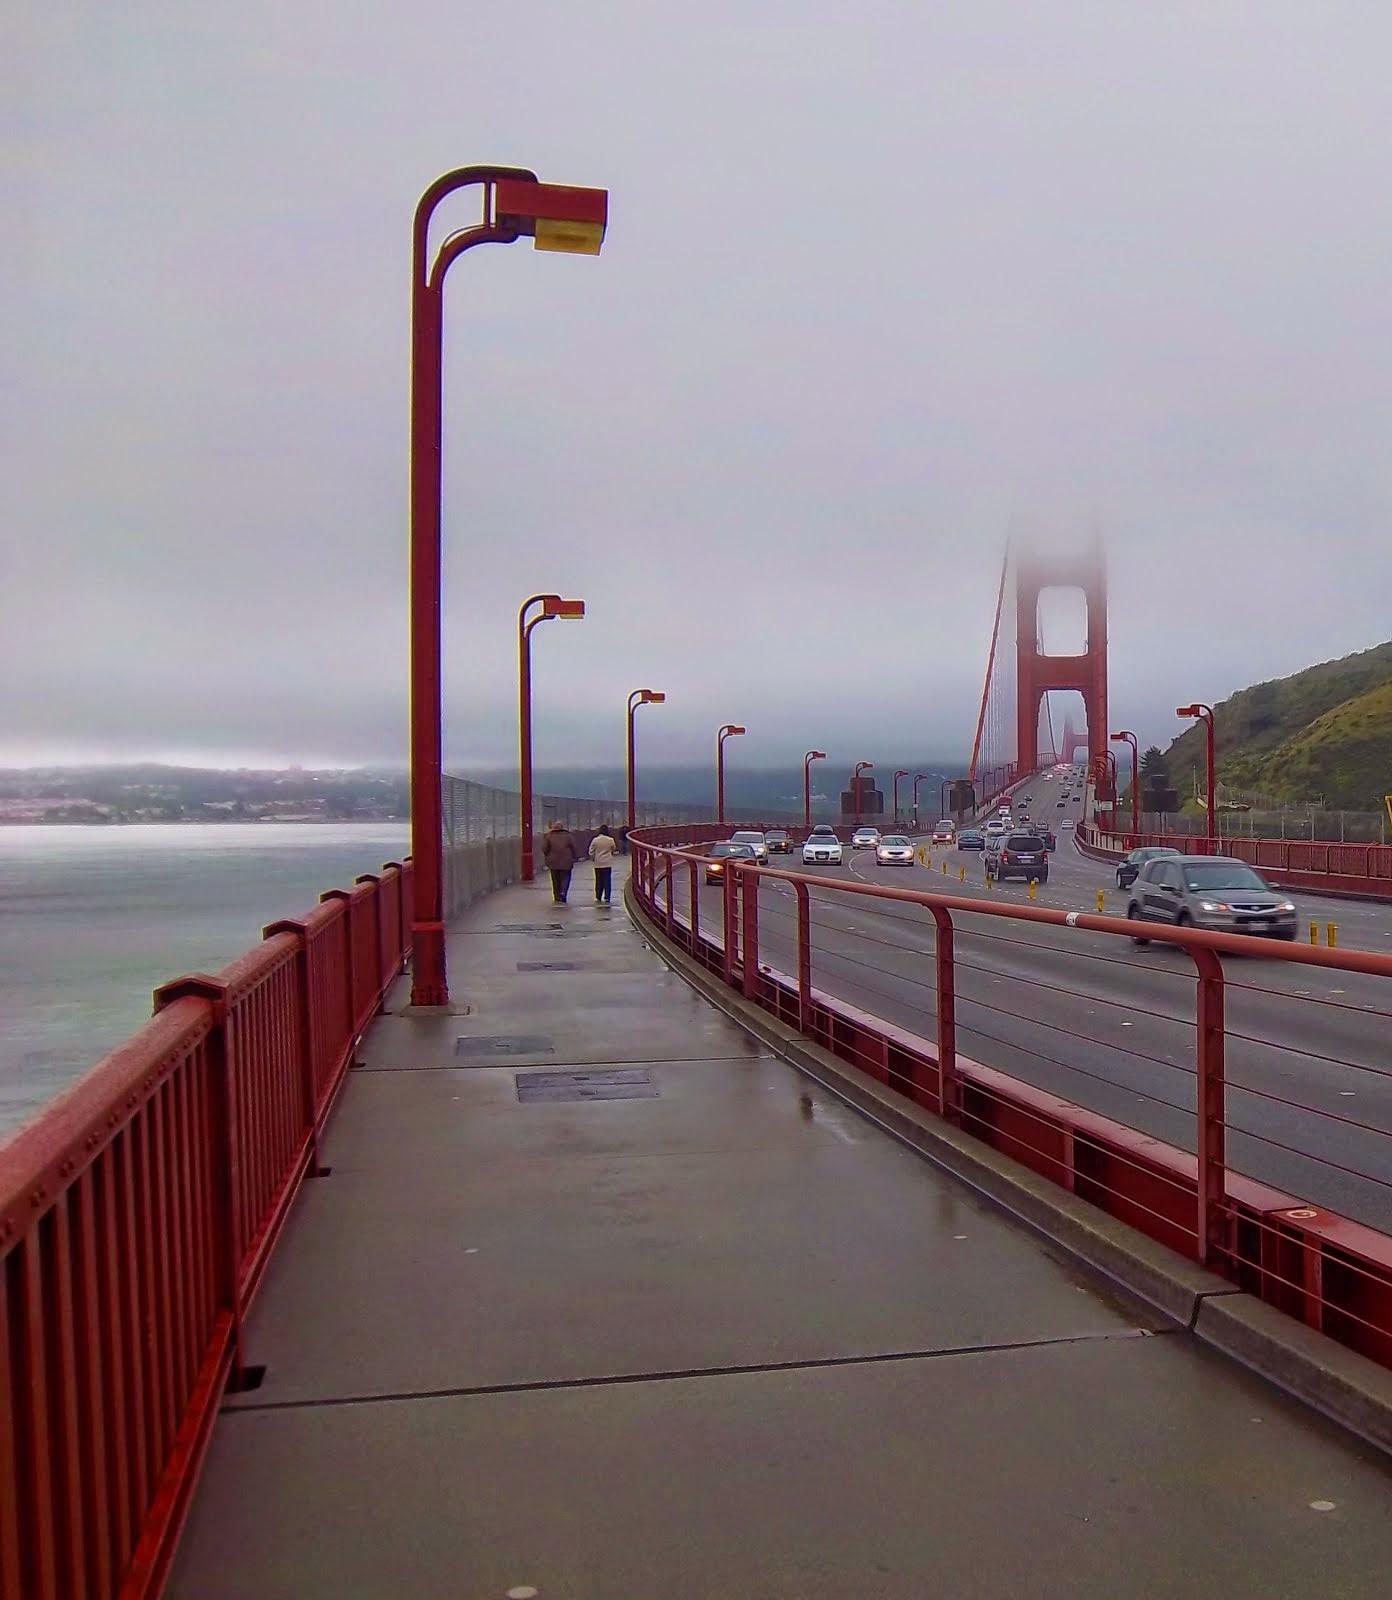 Running the Golden Gate Bridge in San Francisco